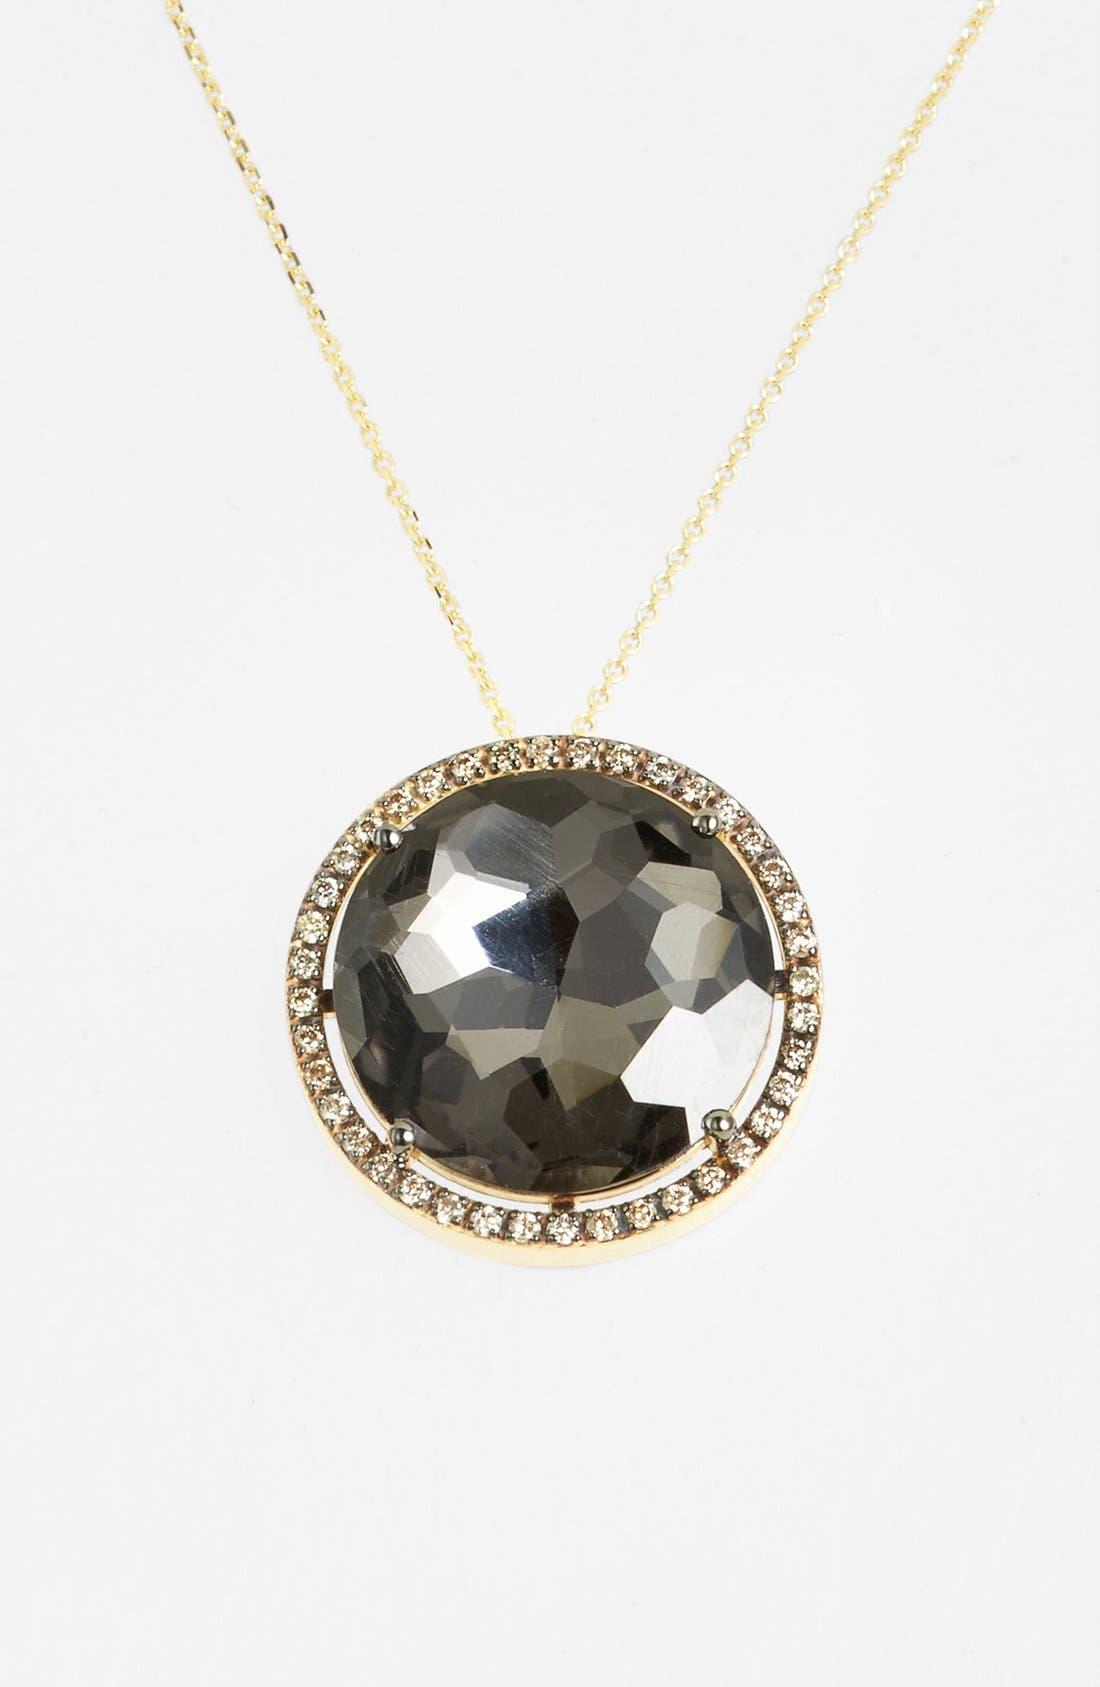 Diamond & Stone Pendant Necklace, Yellow Gold/ Black Quartz